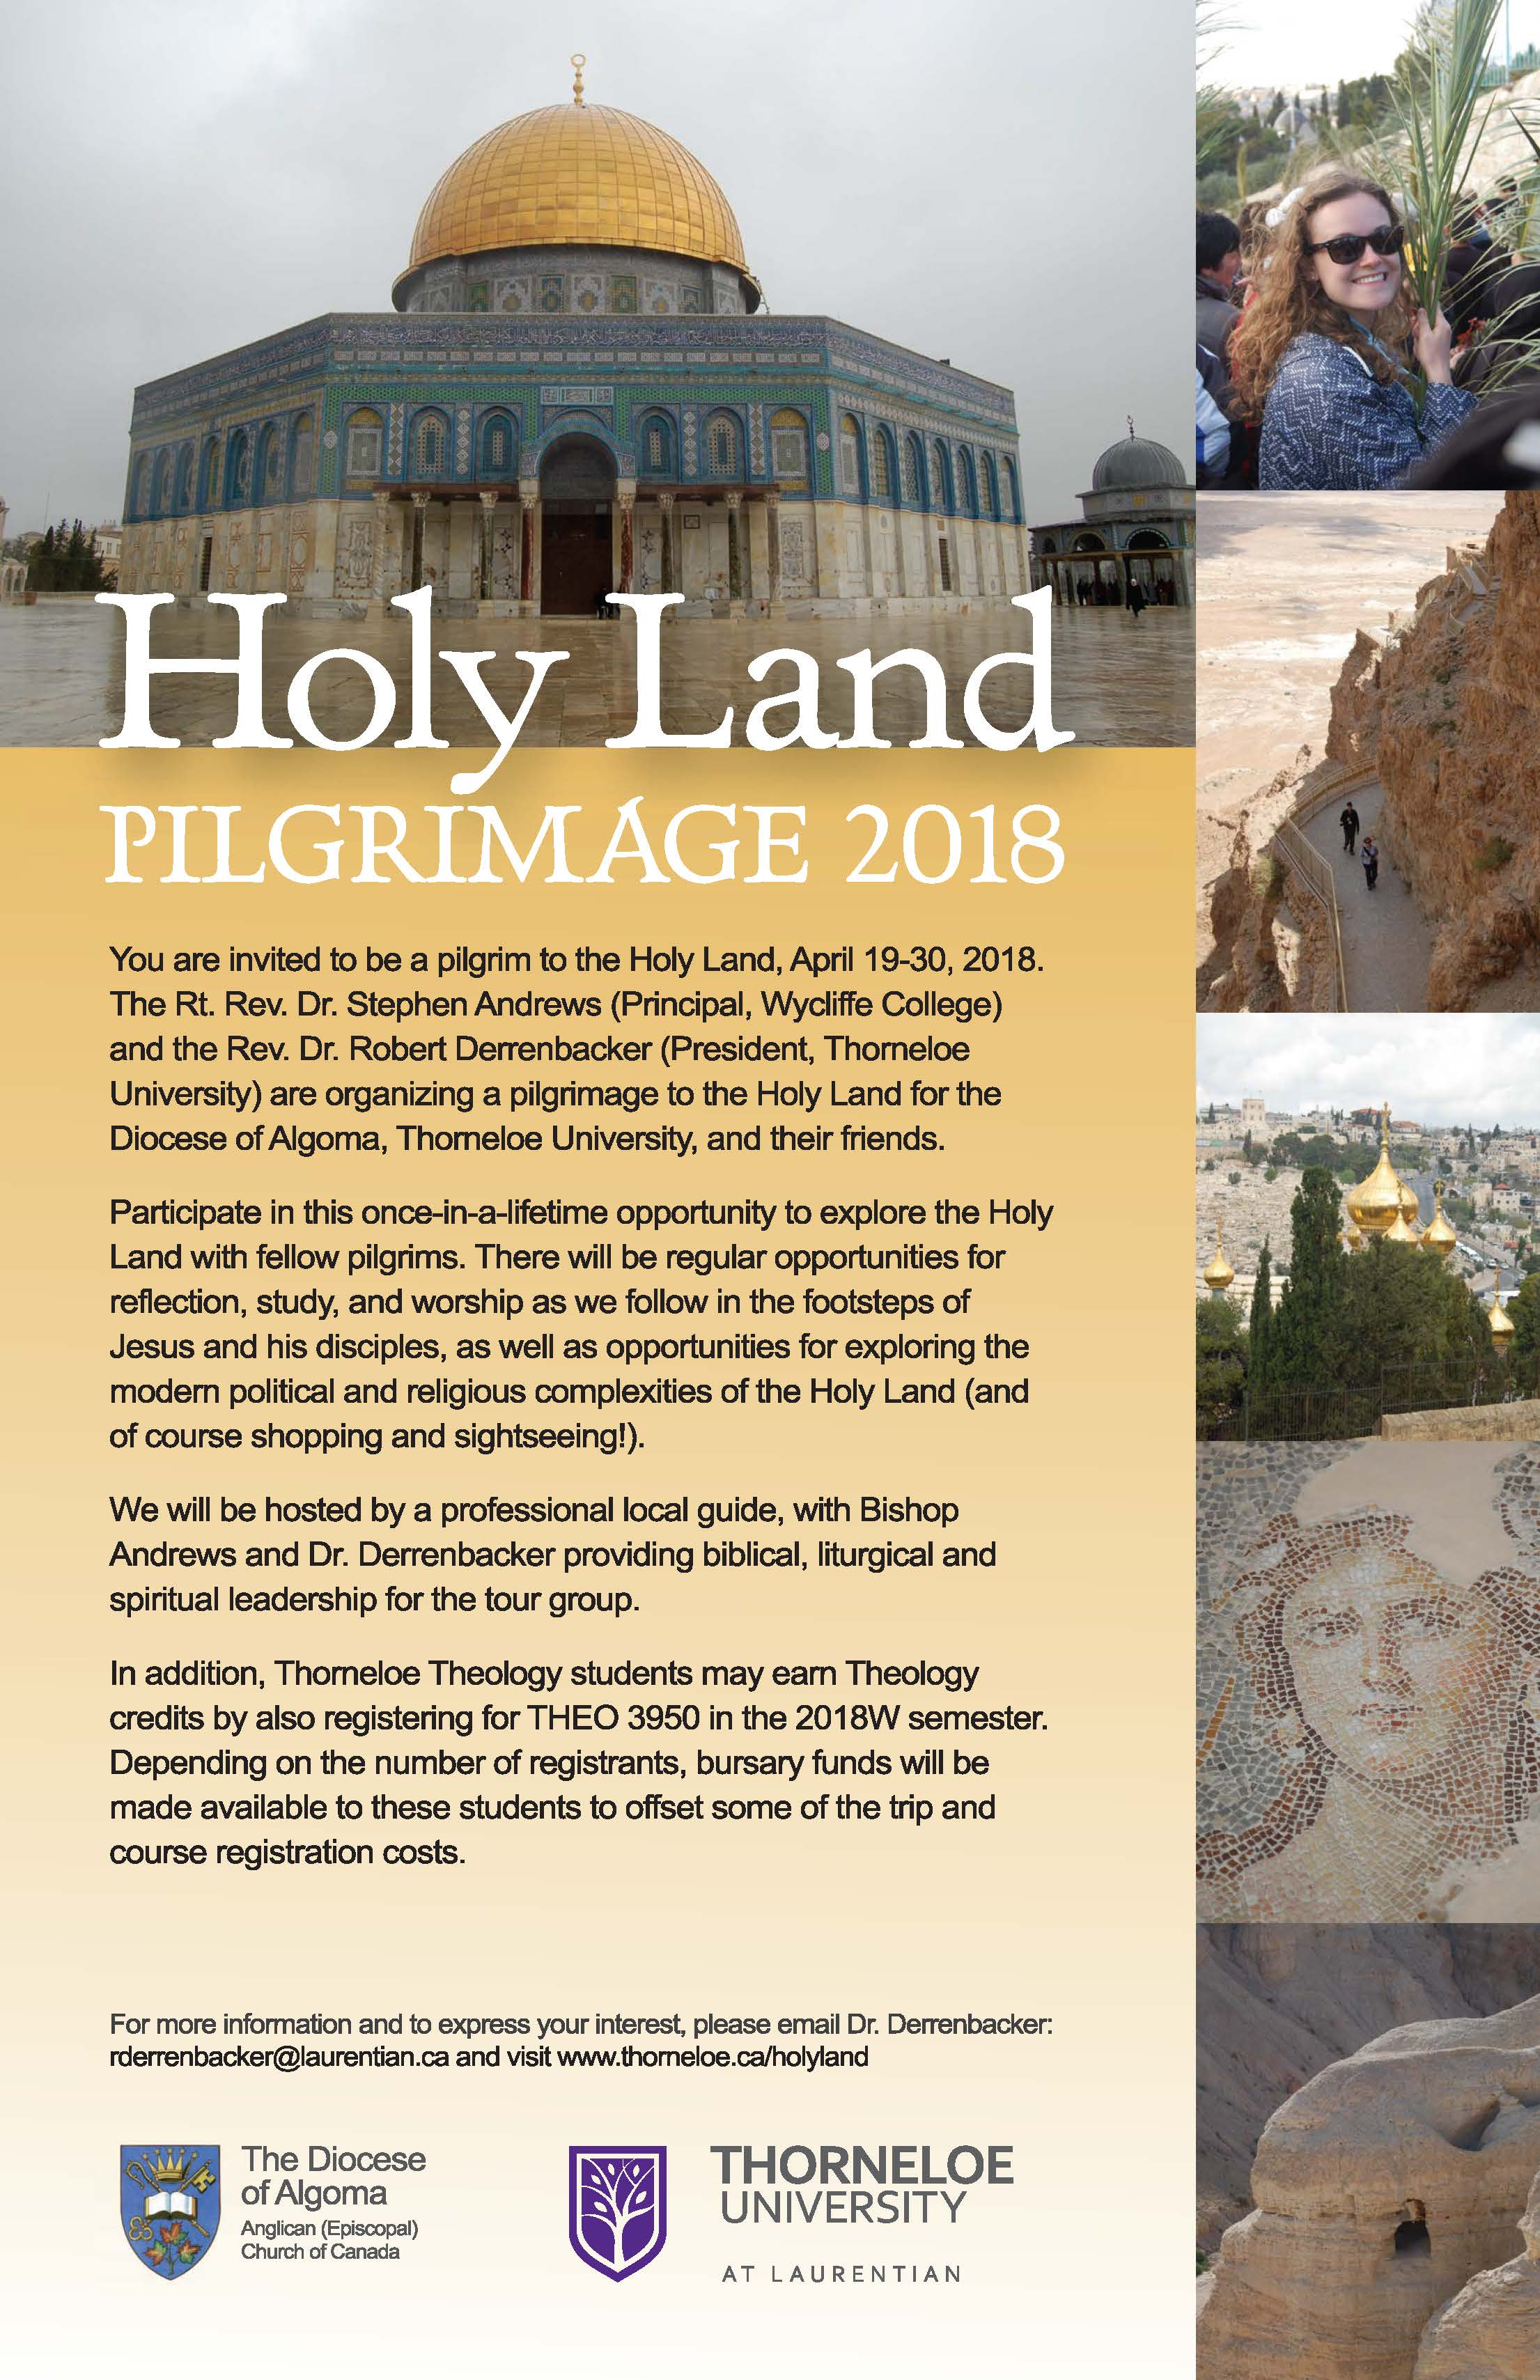 Pilgrims are ... Pilgrimage to the Holy Land. Pilgrim tours 4